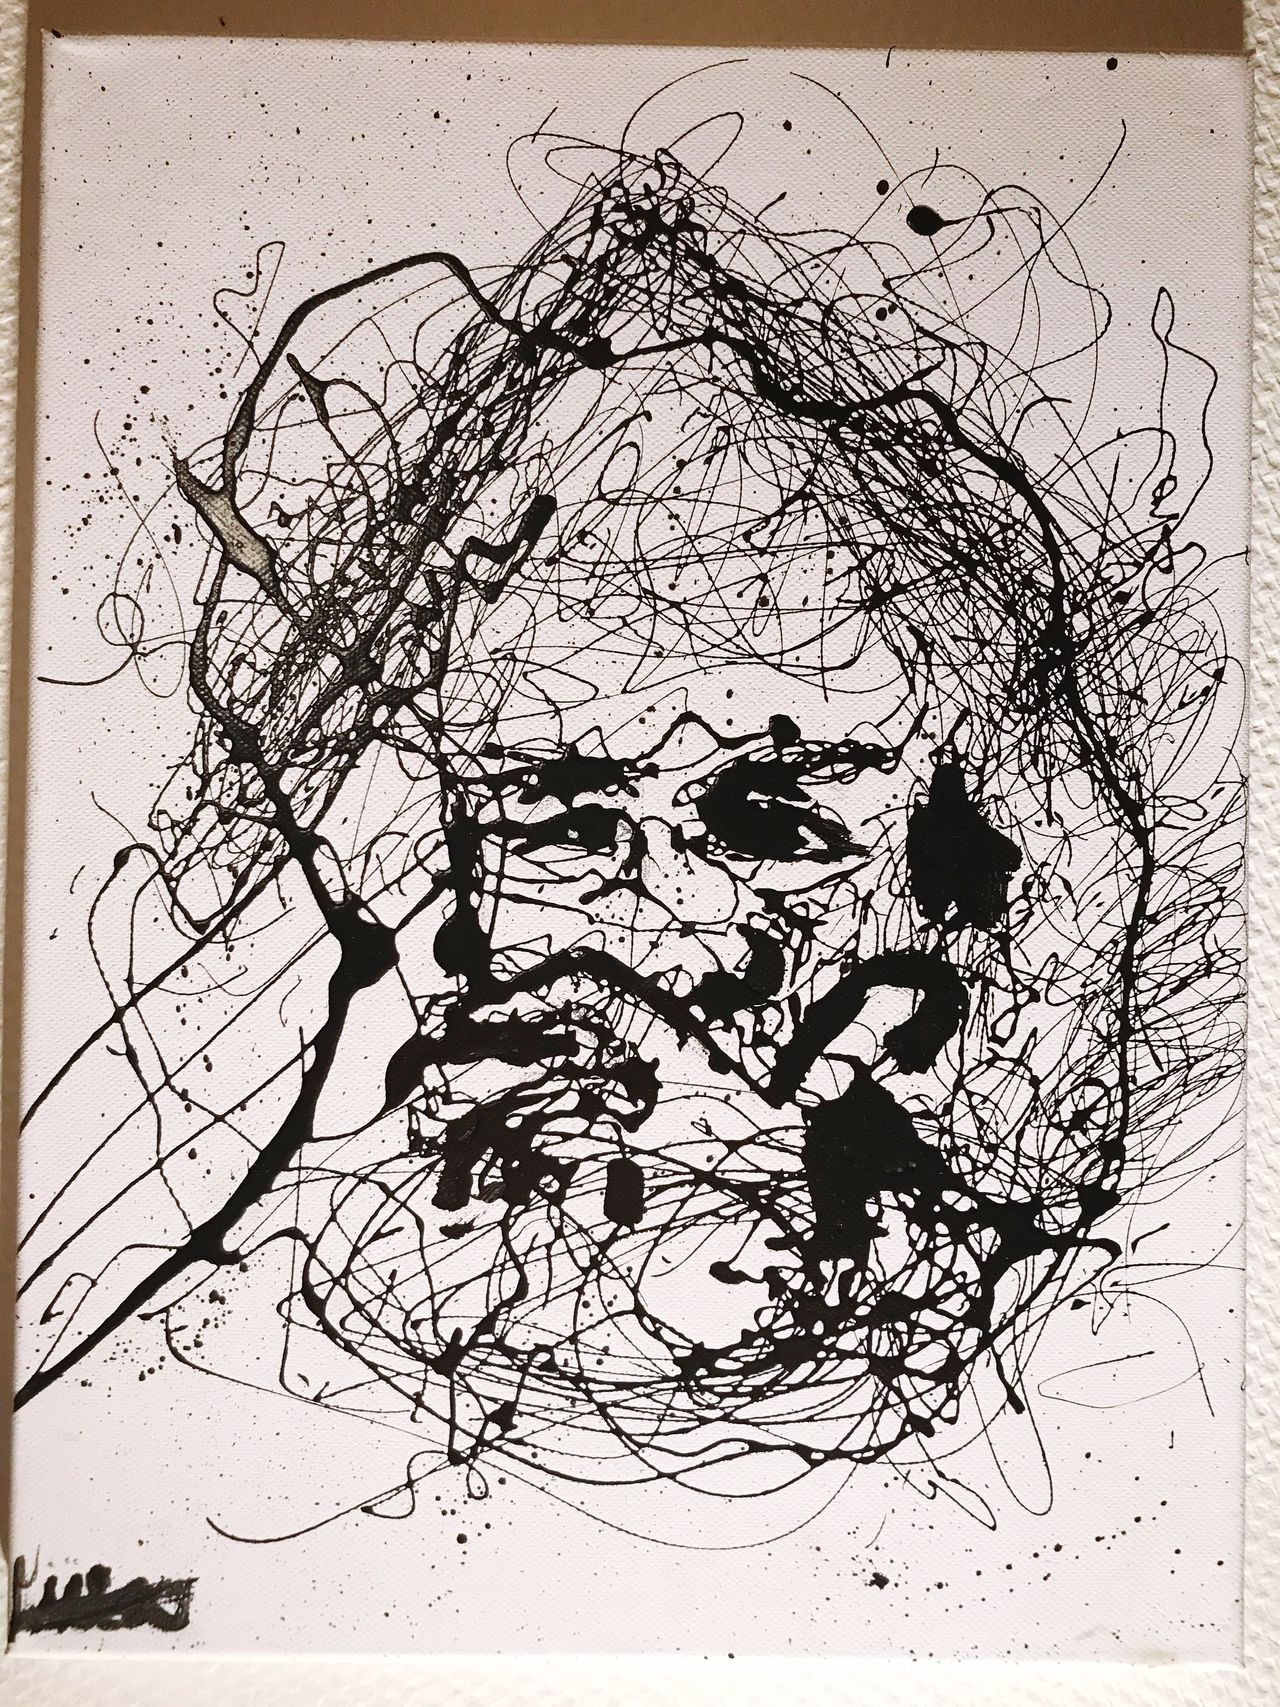 Abstract Pencil Drawing Sketch ArtWork Painting Blackandwhite Canvas Design Ink Shadow Imagination Memories Sketchbook First Eyeem Photo